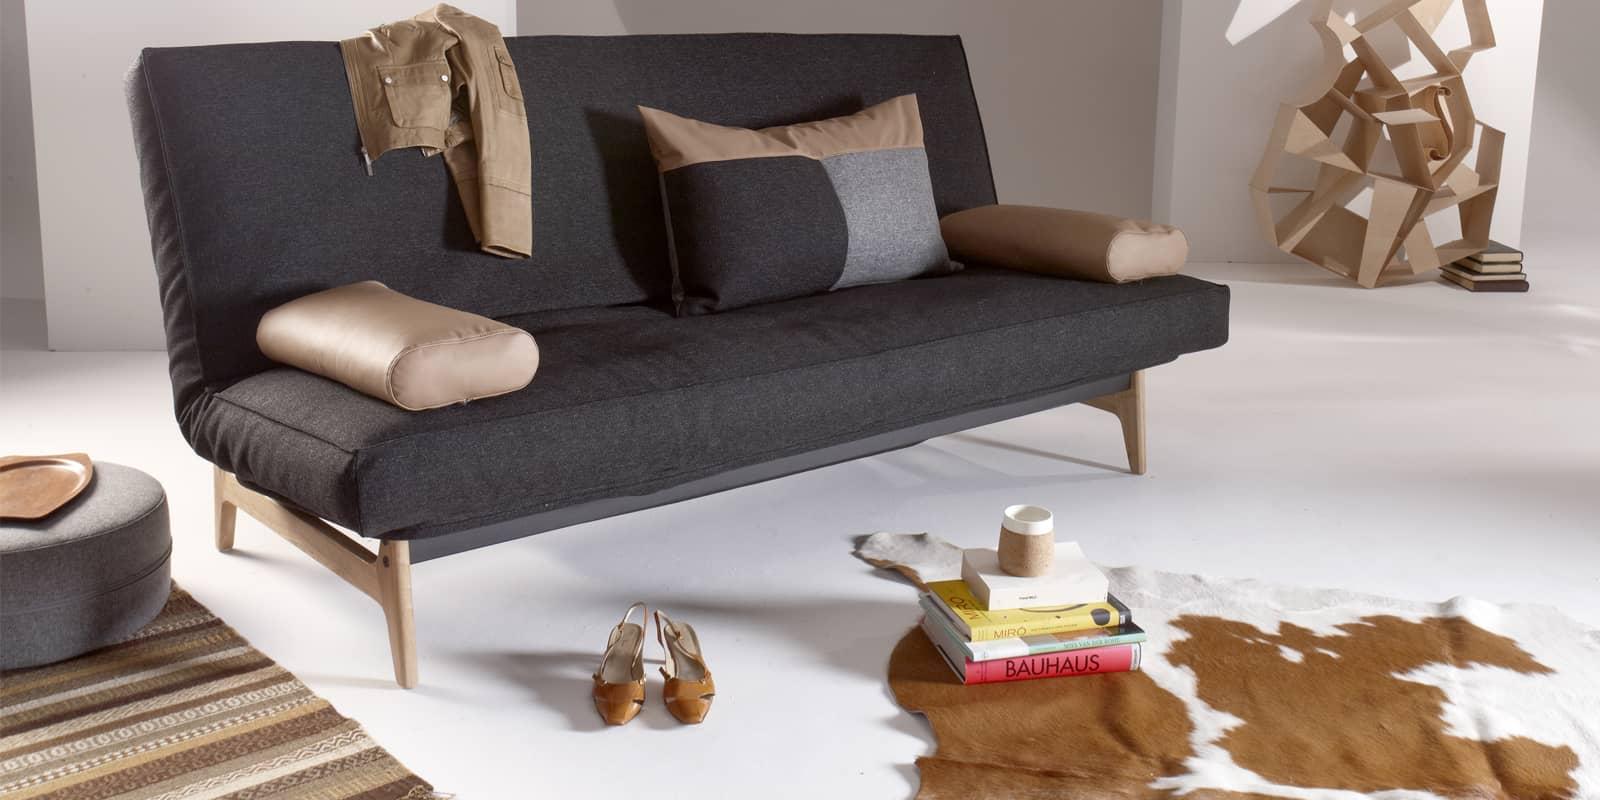 Full Size of Sofa Mit Abnehmbaren Bezug Hussen Abnehmbarer Sofas Ikea Abnehmbar Waschbar Big Abnehmbarem Grau Modulares Günstig Recamiere Küche Elektrogeräten Kaufen Sofa Sofa Mit Abnehmbaren Bezug